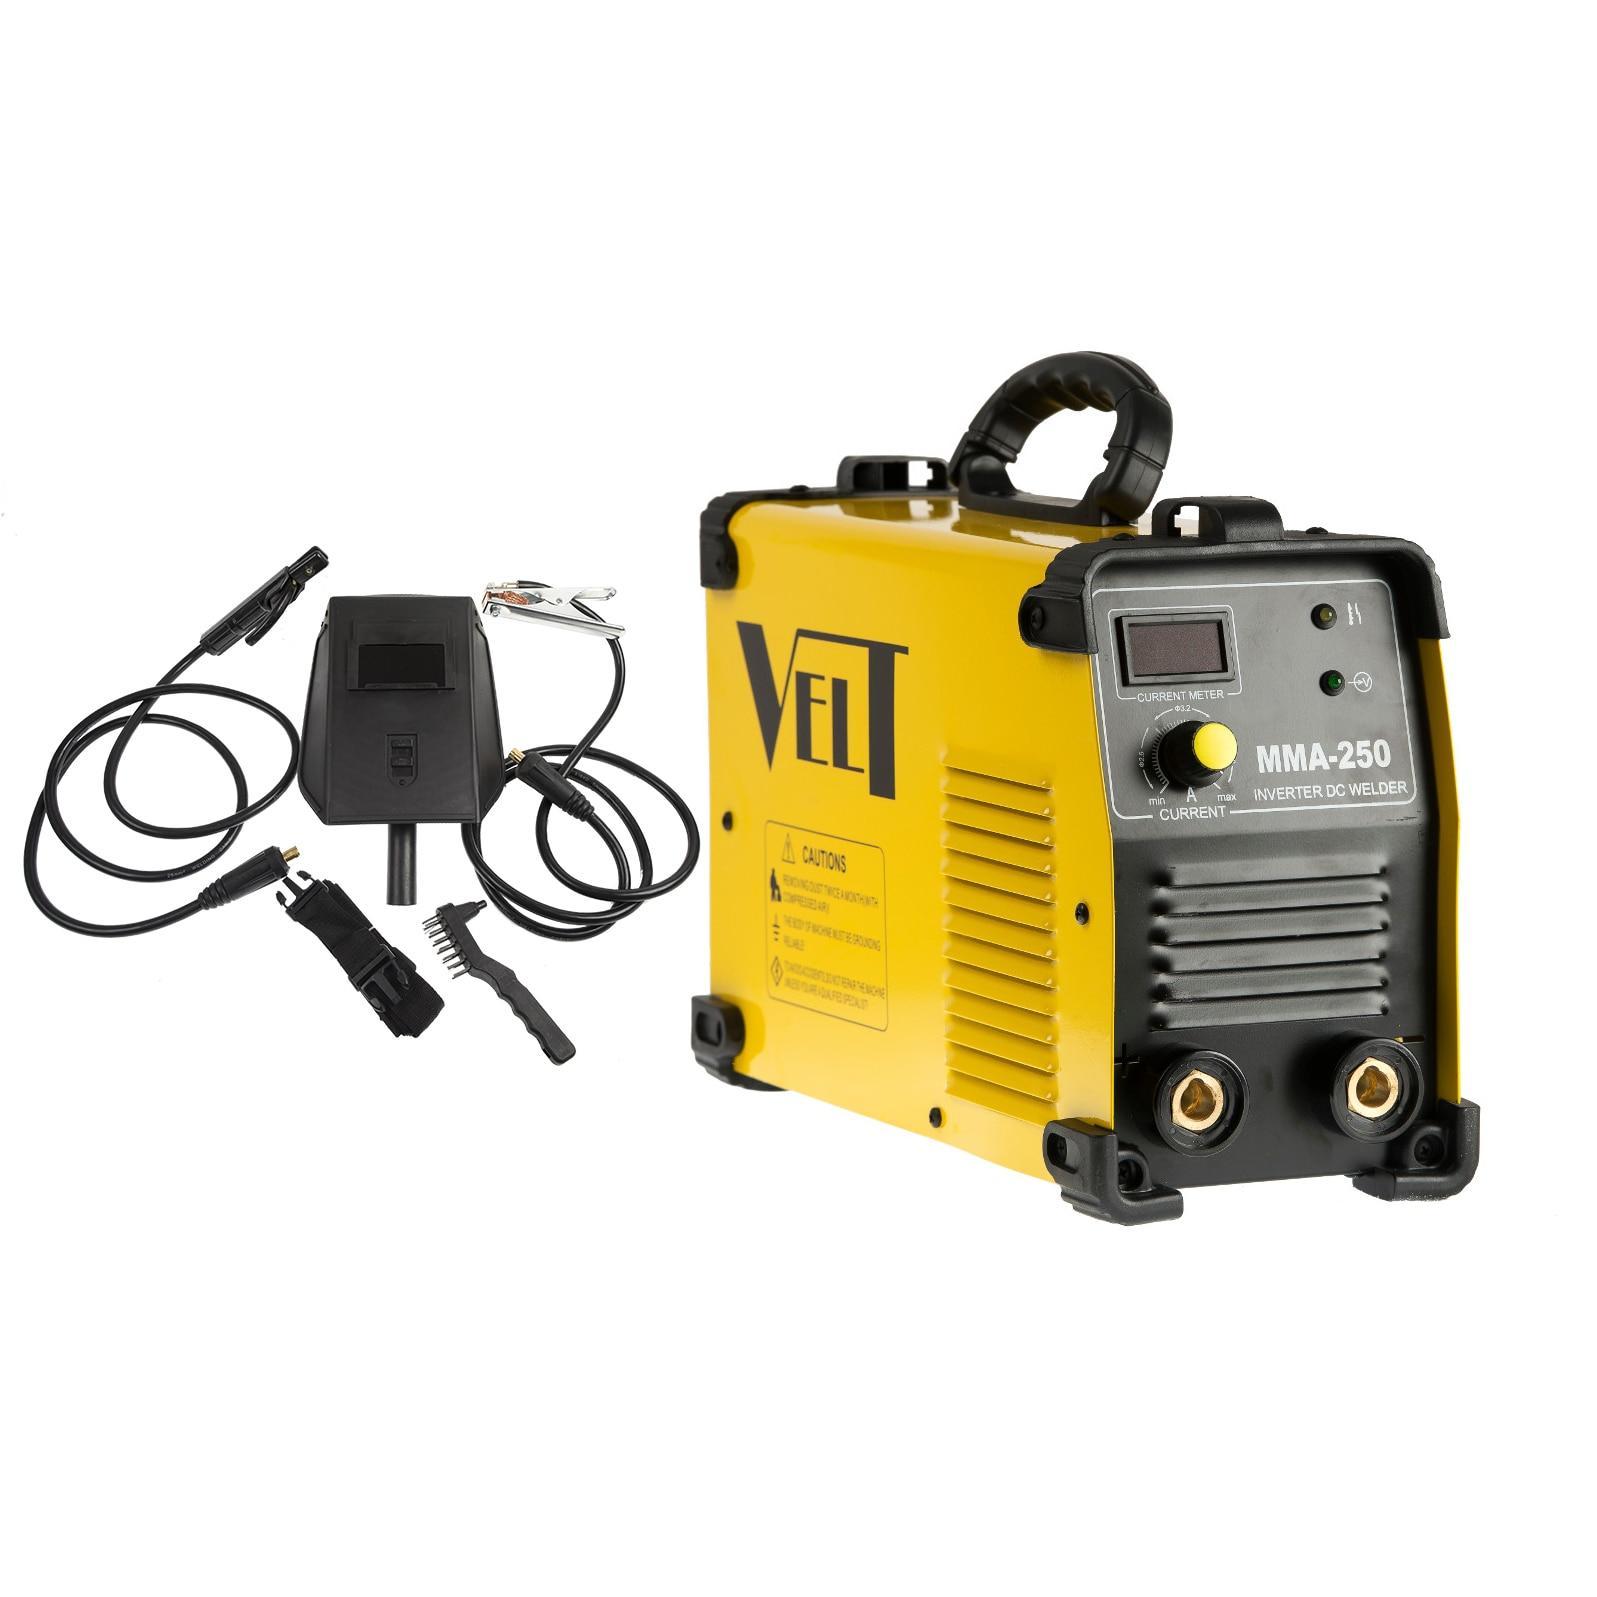 Fotografie Invertor de sudura industrial Velt MMA 250, 250 A, 230 V, electrod 5 mm + accesorii